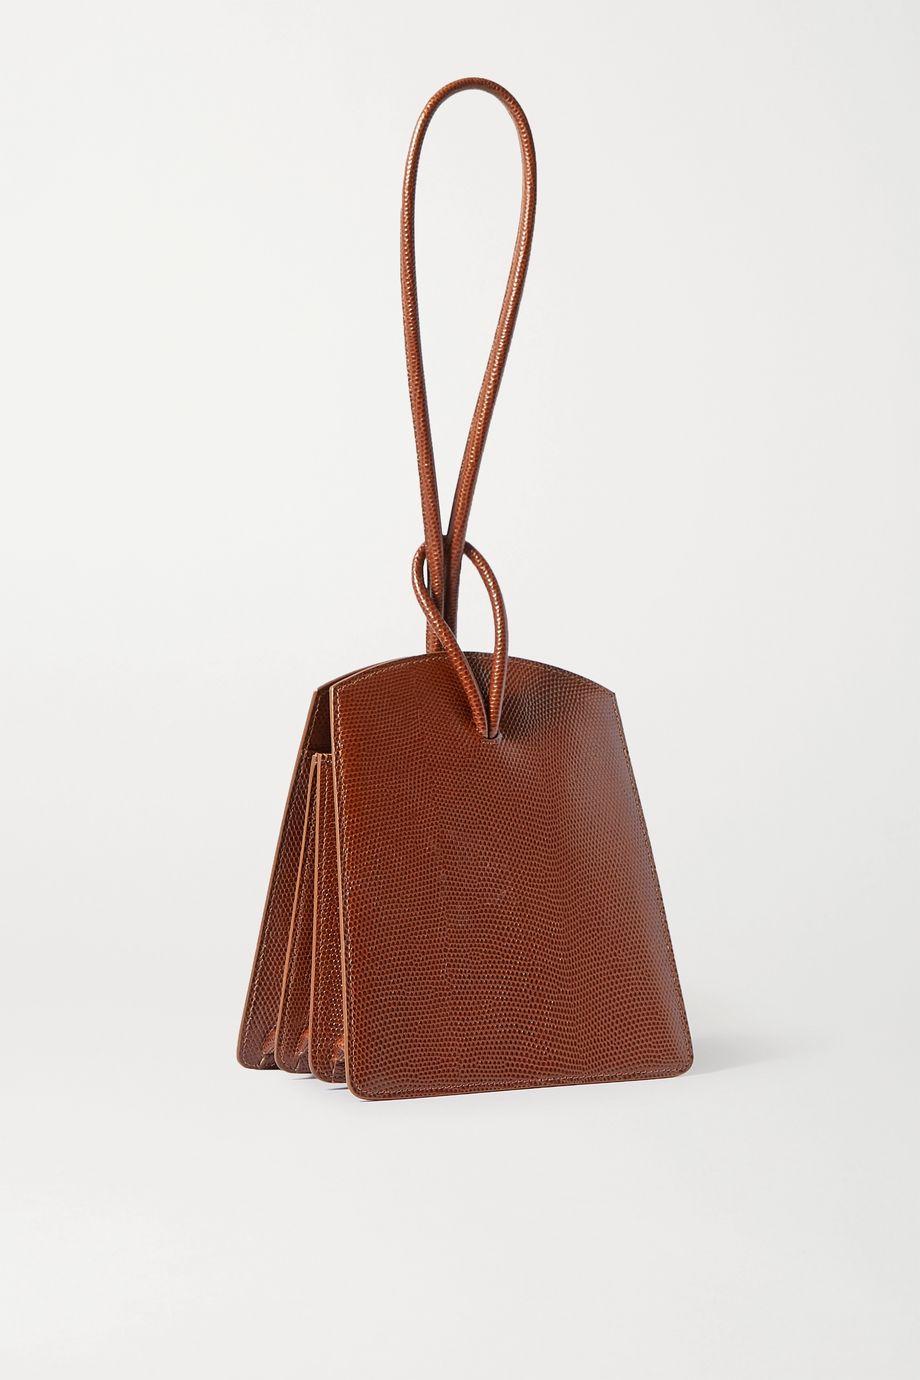 Little Liffner Loop lizard-effect leather tote